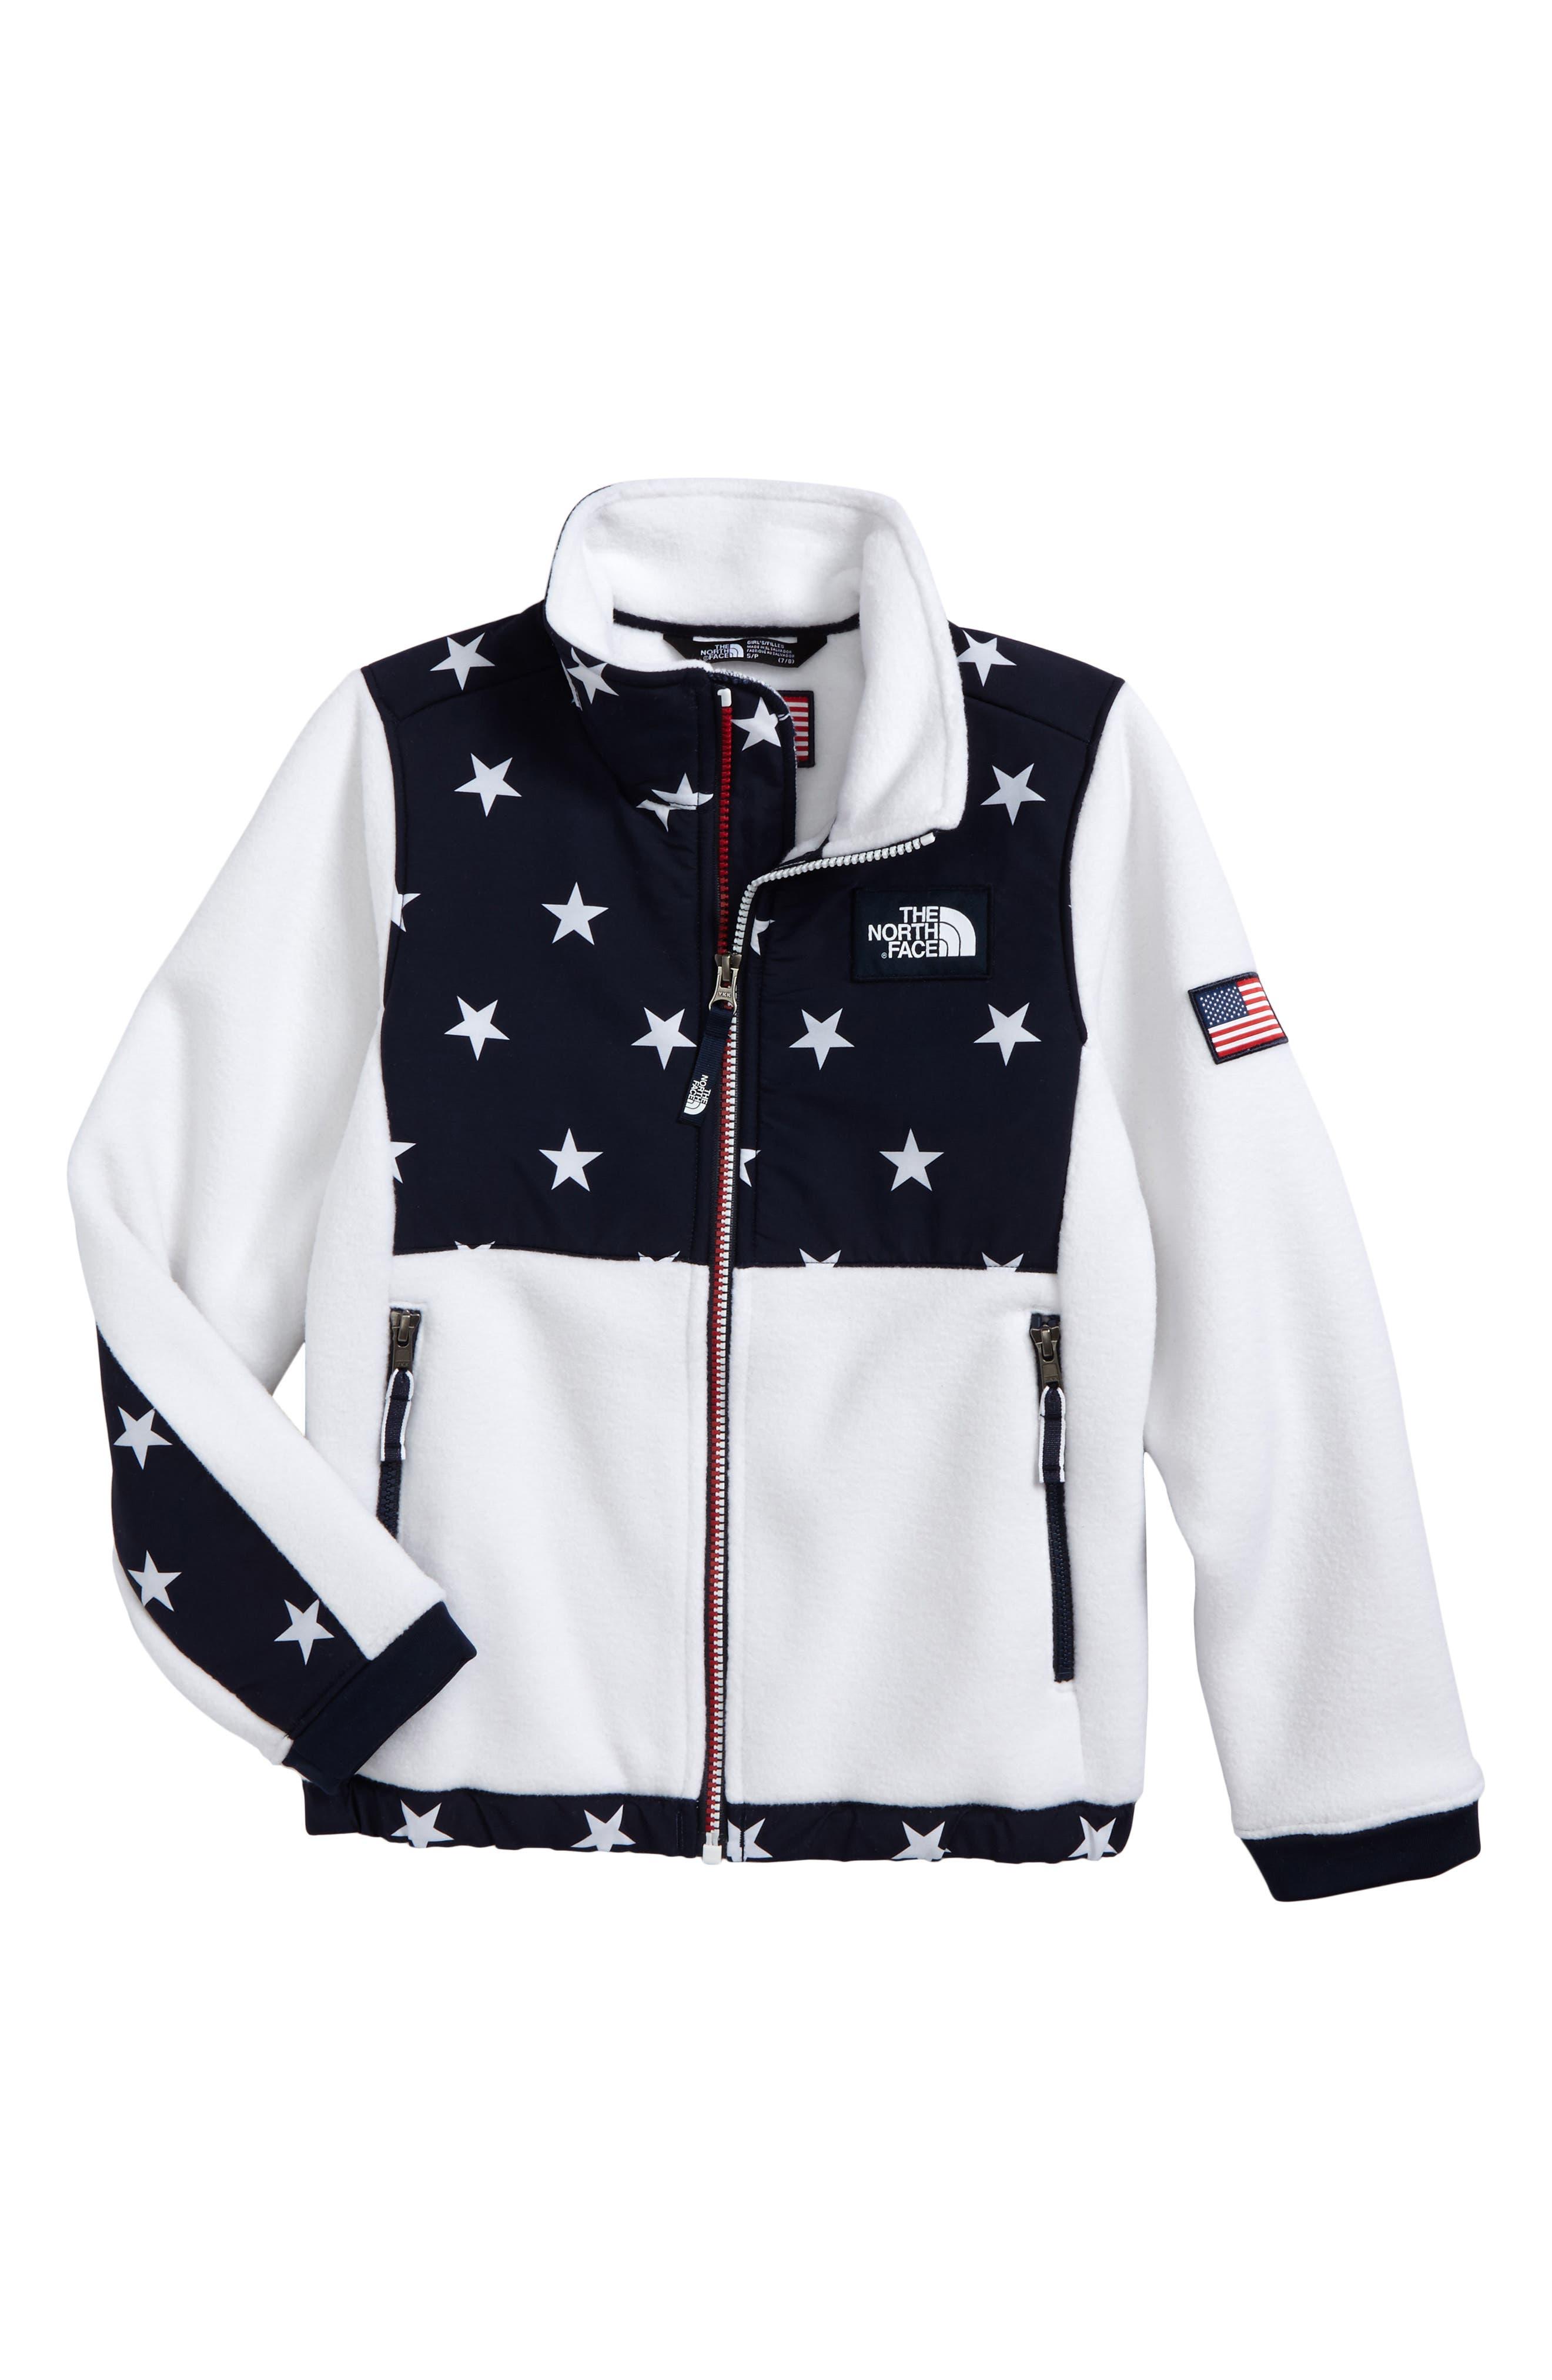 Denali Recycled Fleece Jacket,                             Main thumbnail 1, color,                             100